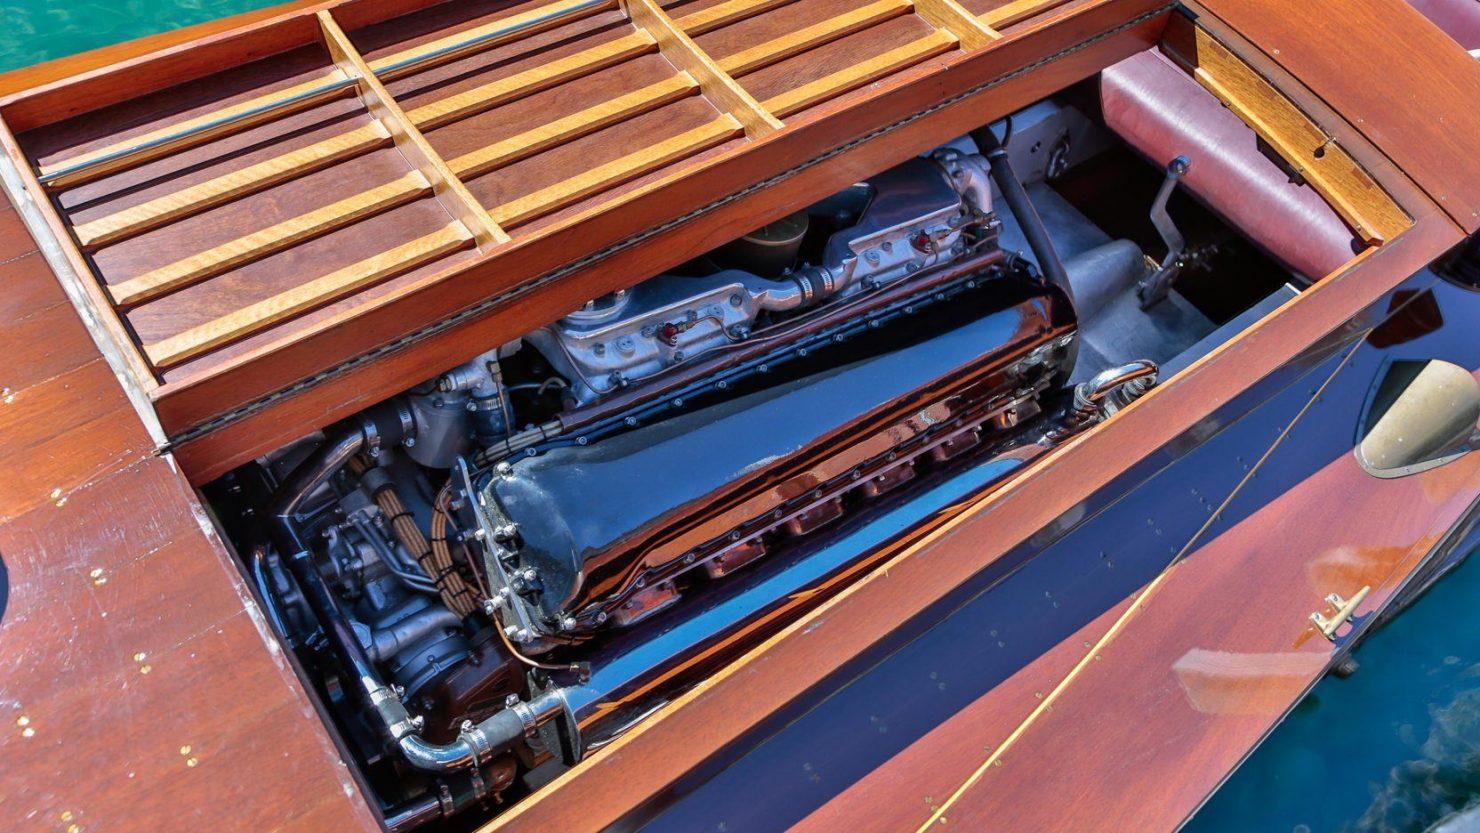 mahogany speed boat 9 1480x833 - 27 Liter V12 Brown & Bassett Gentleman's Racer